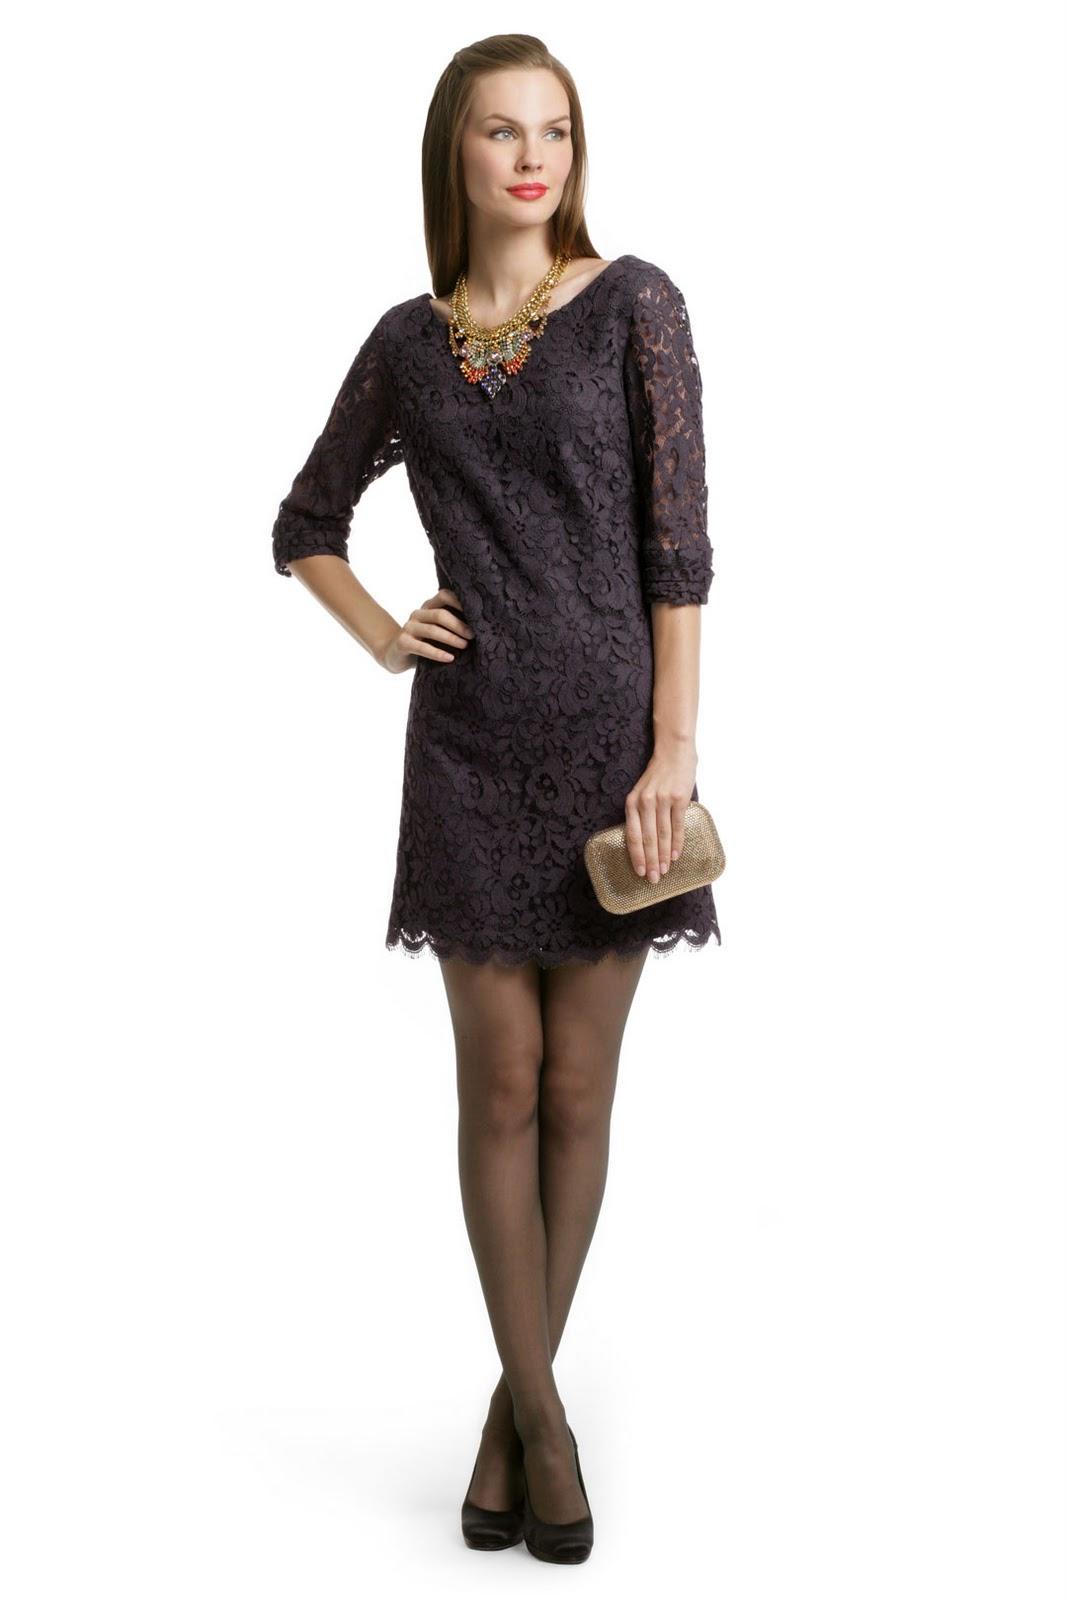 Fashion Tights Skirt Dress Heels Dress Look Sexy Look